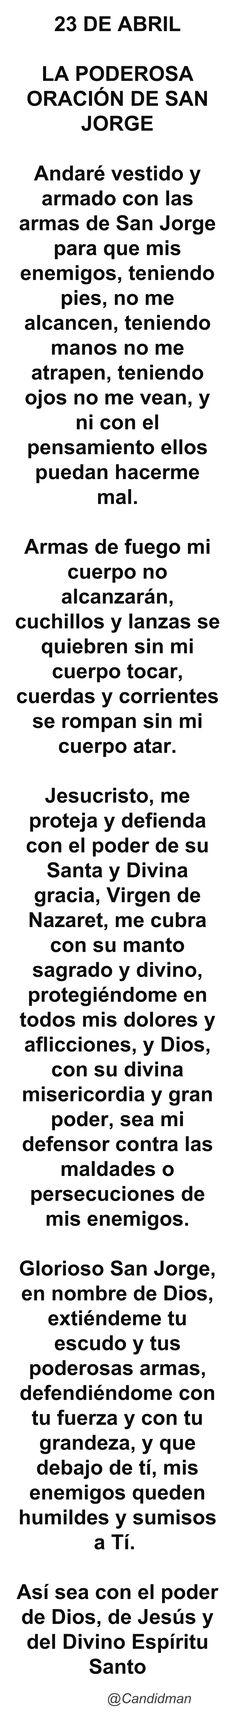 A San Jorge.